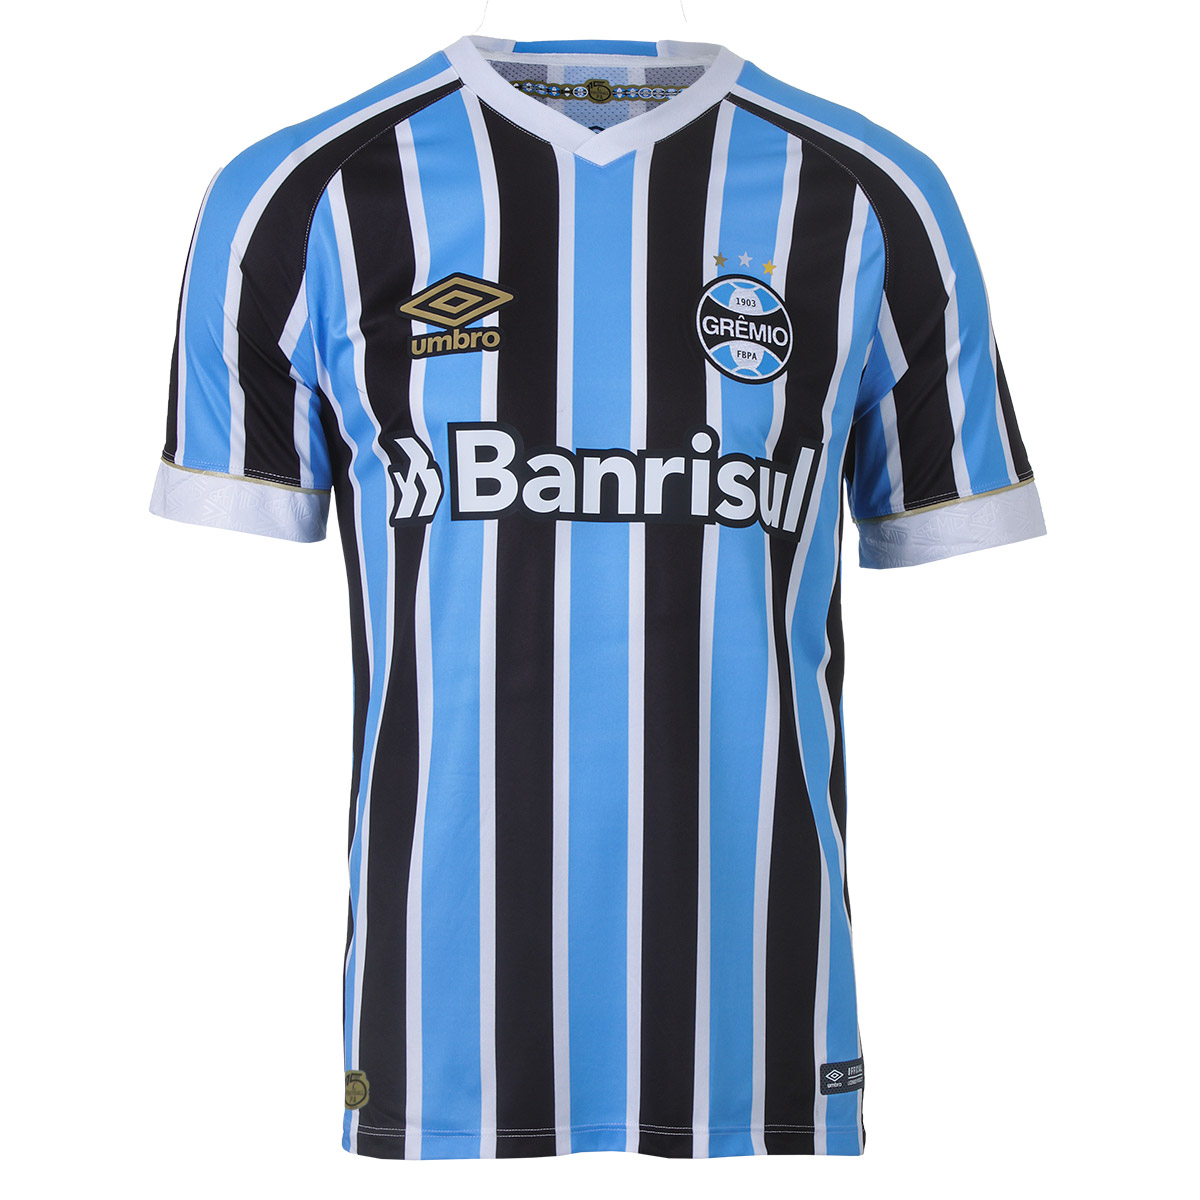 Camiseta Masc. Umbro Gremio Of. 1 2018 - Azul Marinho/Preto